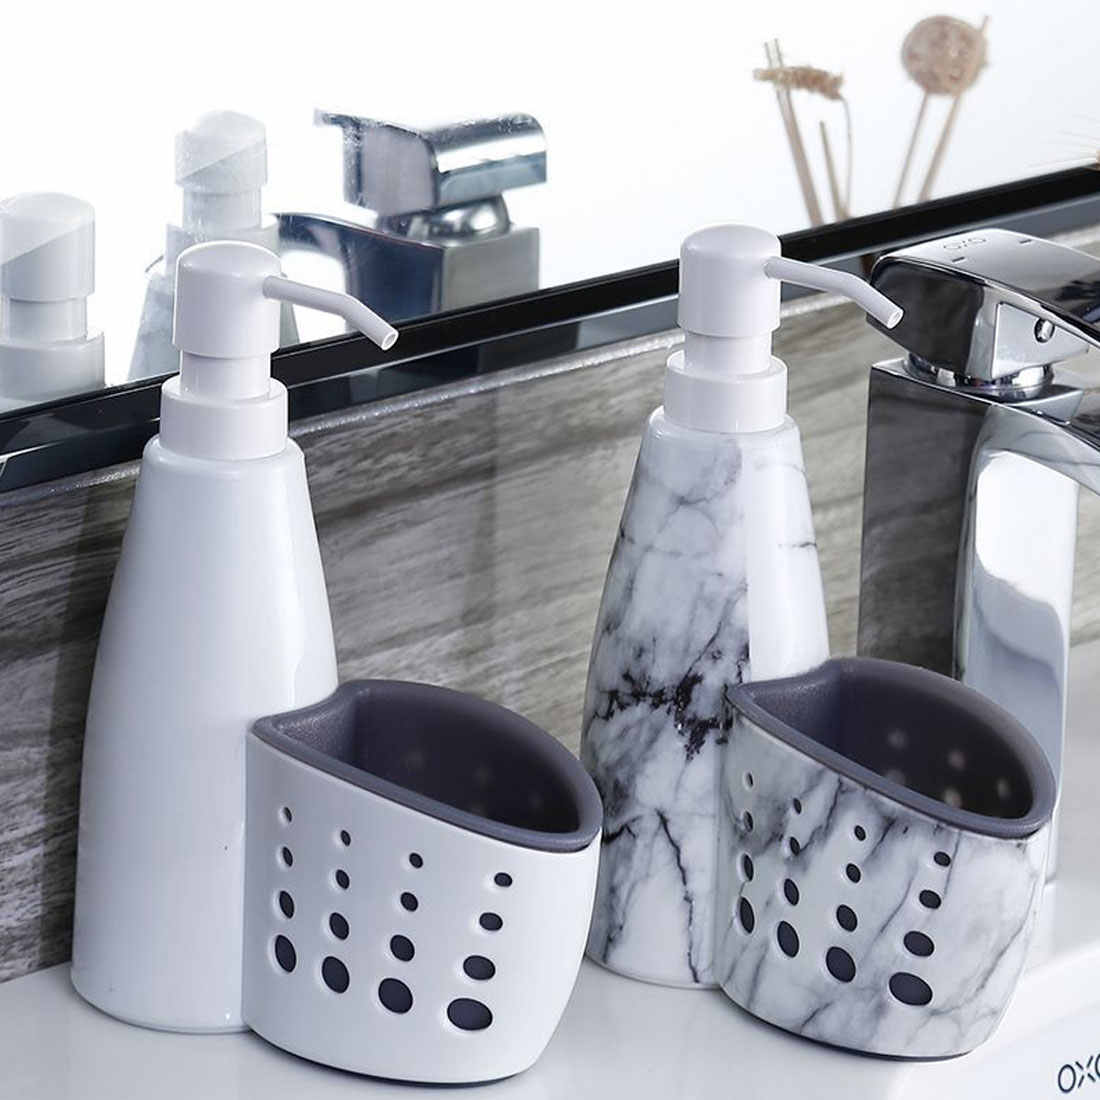 New Multifunction Kitchen Bathroom Liquid Detergent Storage Box Rack Cleaning Sponge Drainboard Soap Holder